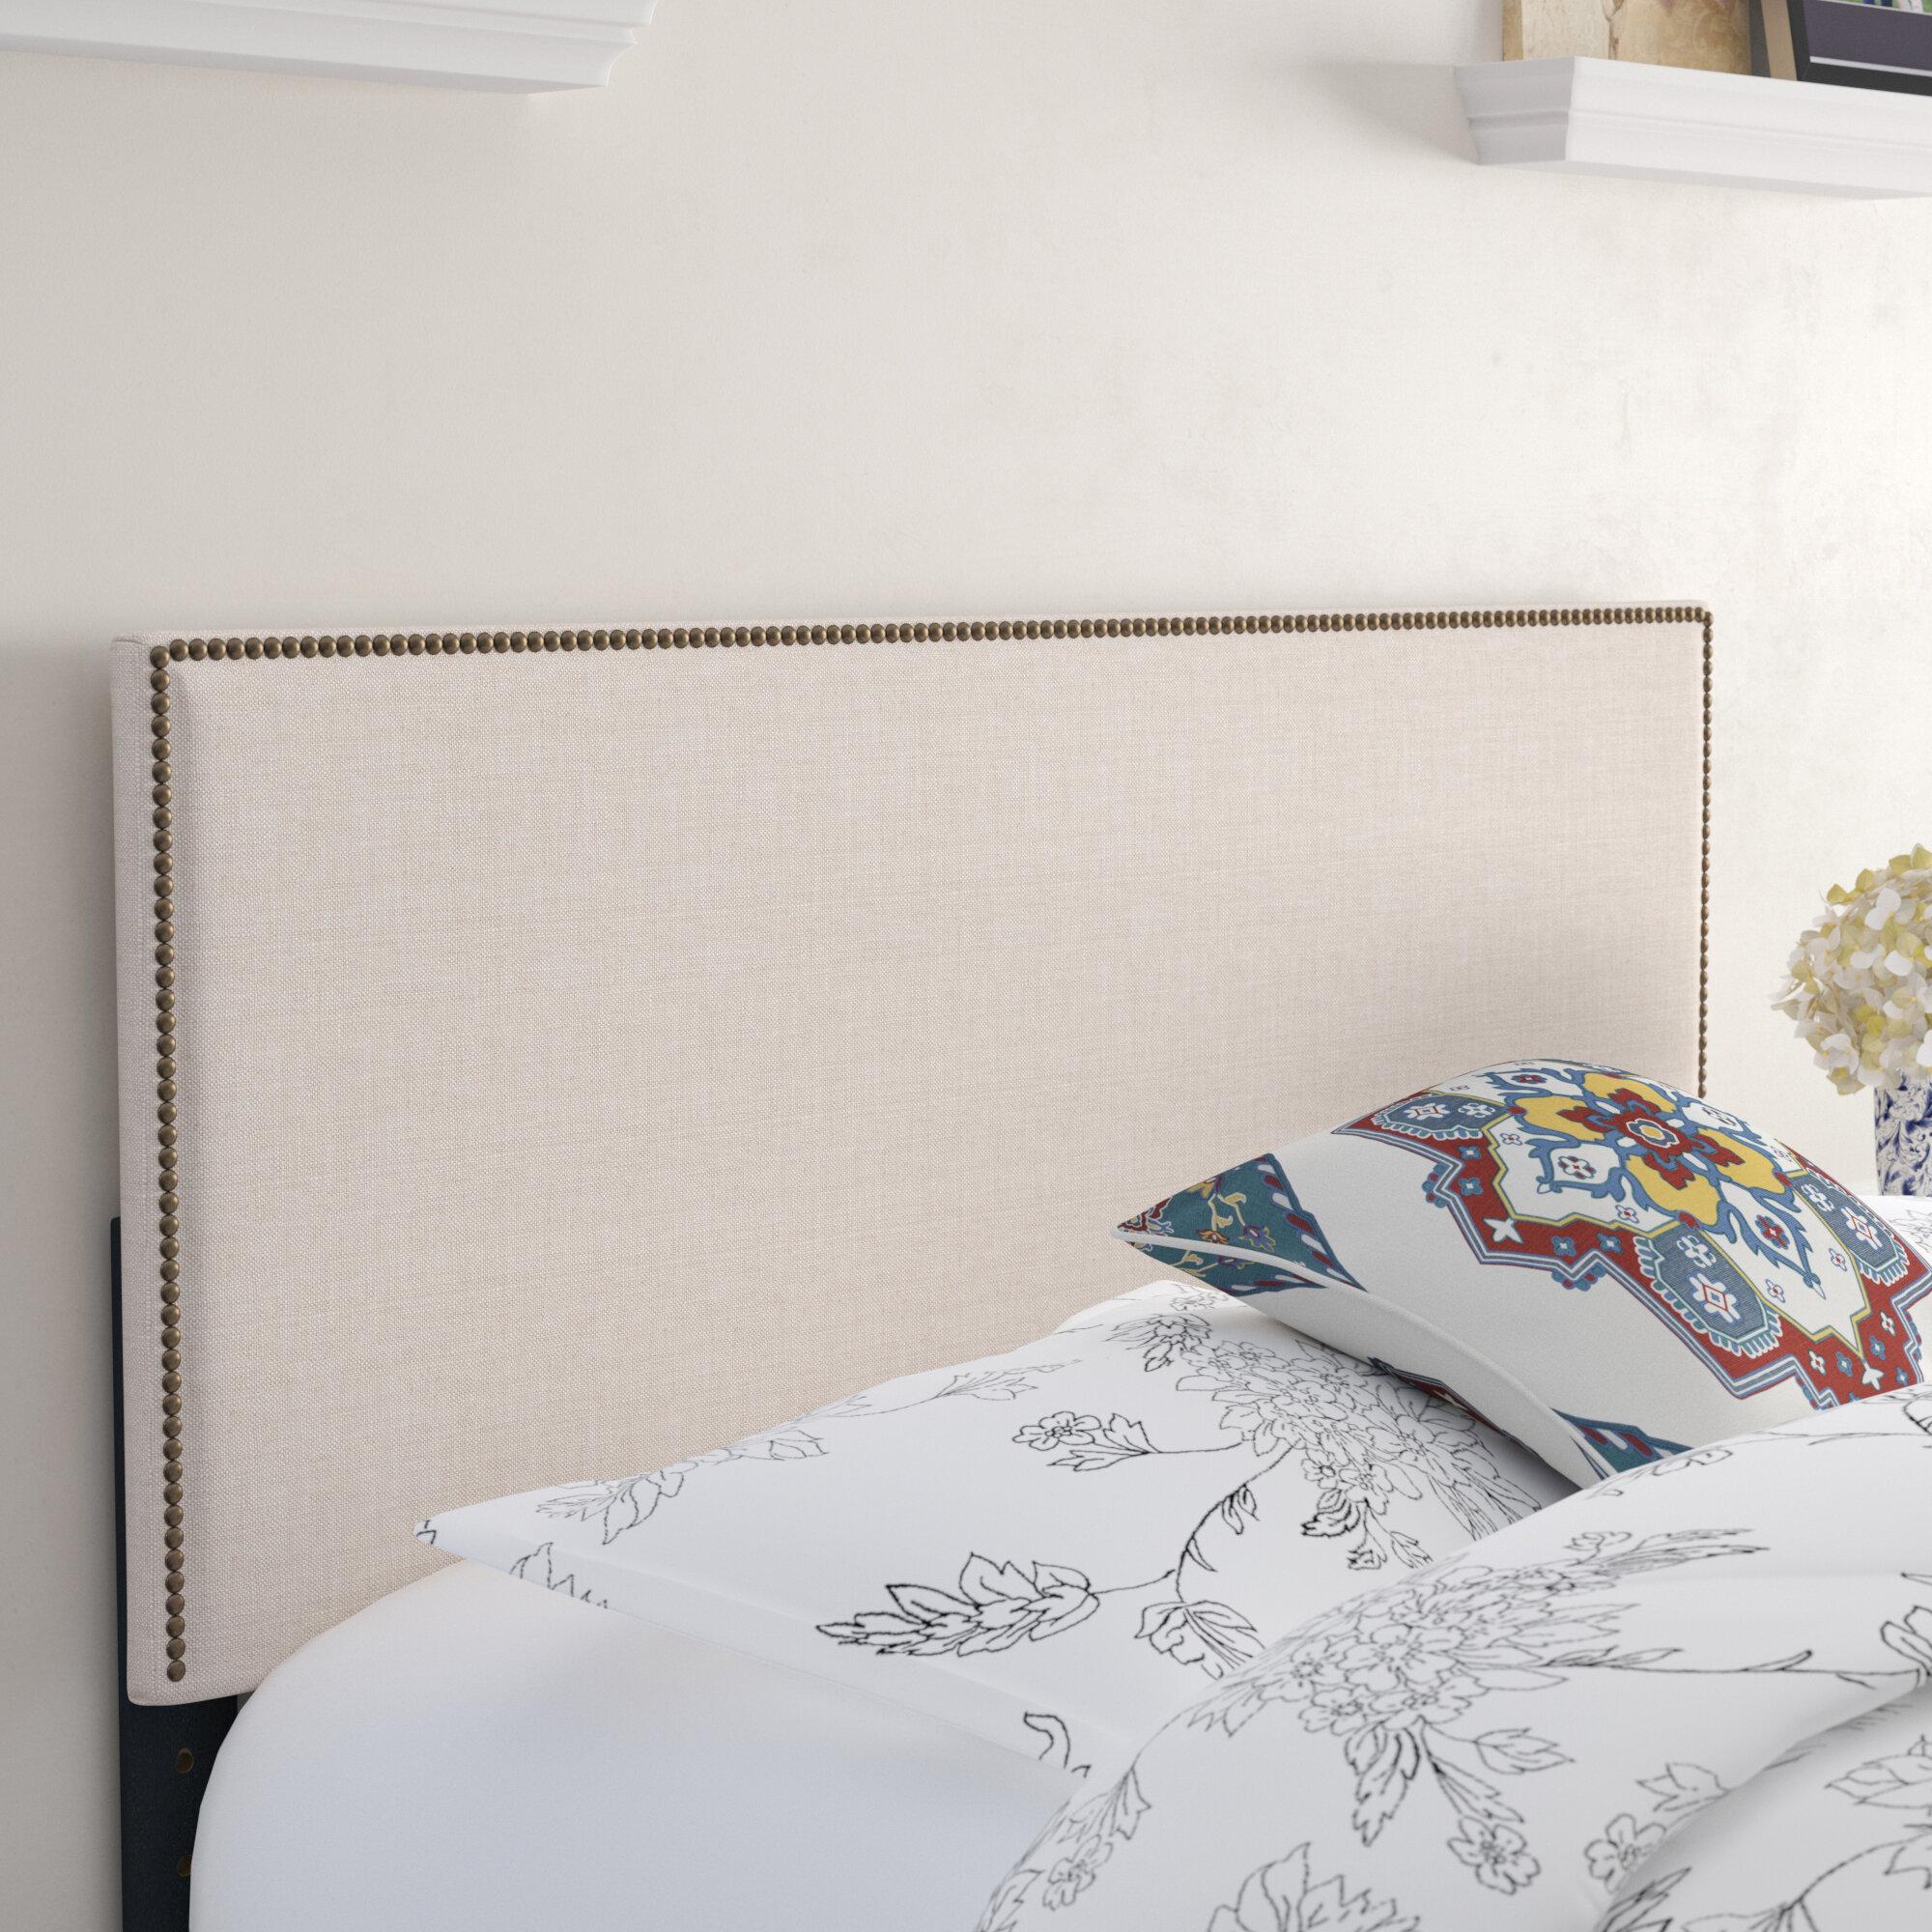 Manufacture Francaise Des Textiles D Ameublement unger upholstered panel headboard